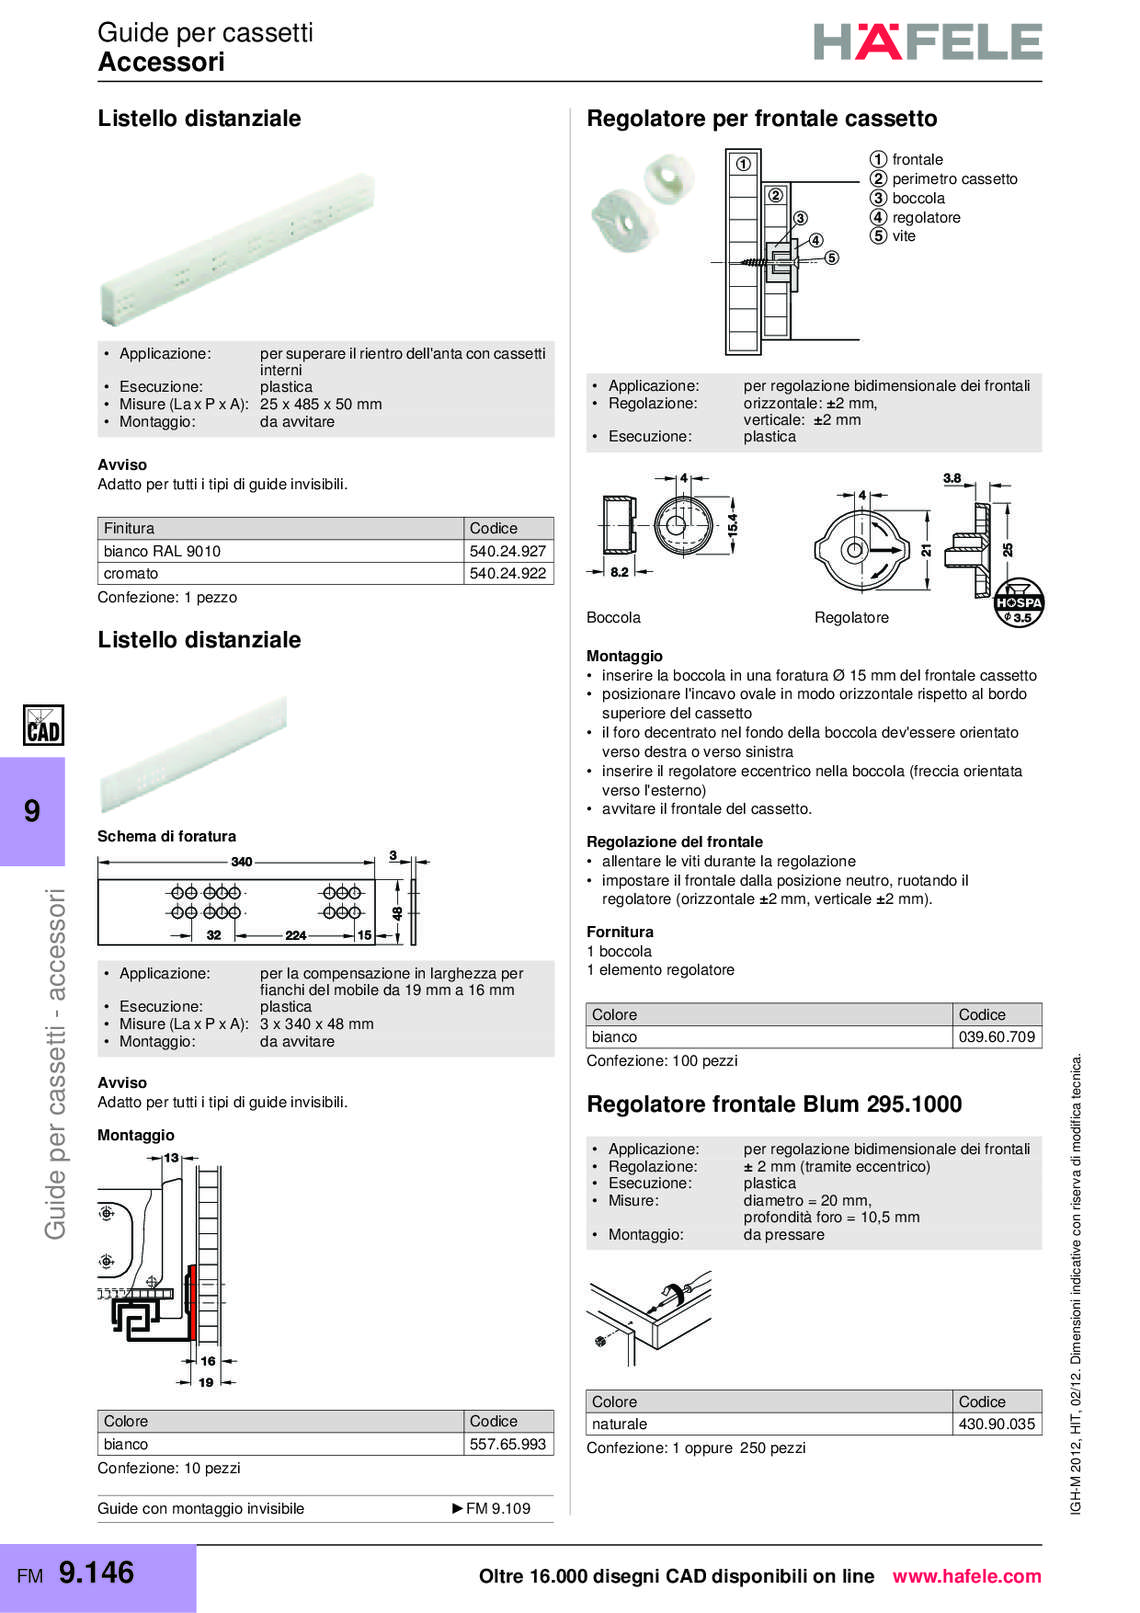 hafele-spondine-e-guide-per-mobili_40_205.jpg